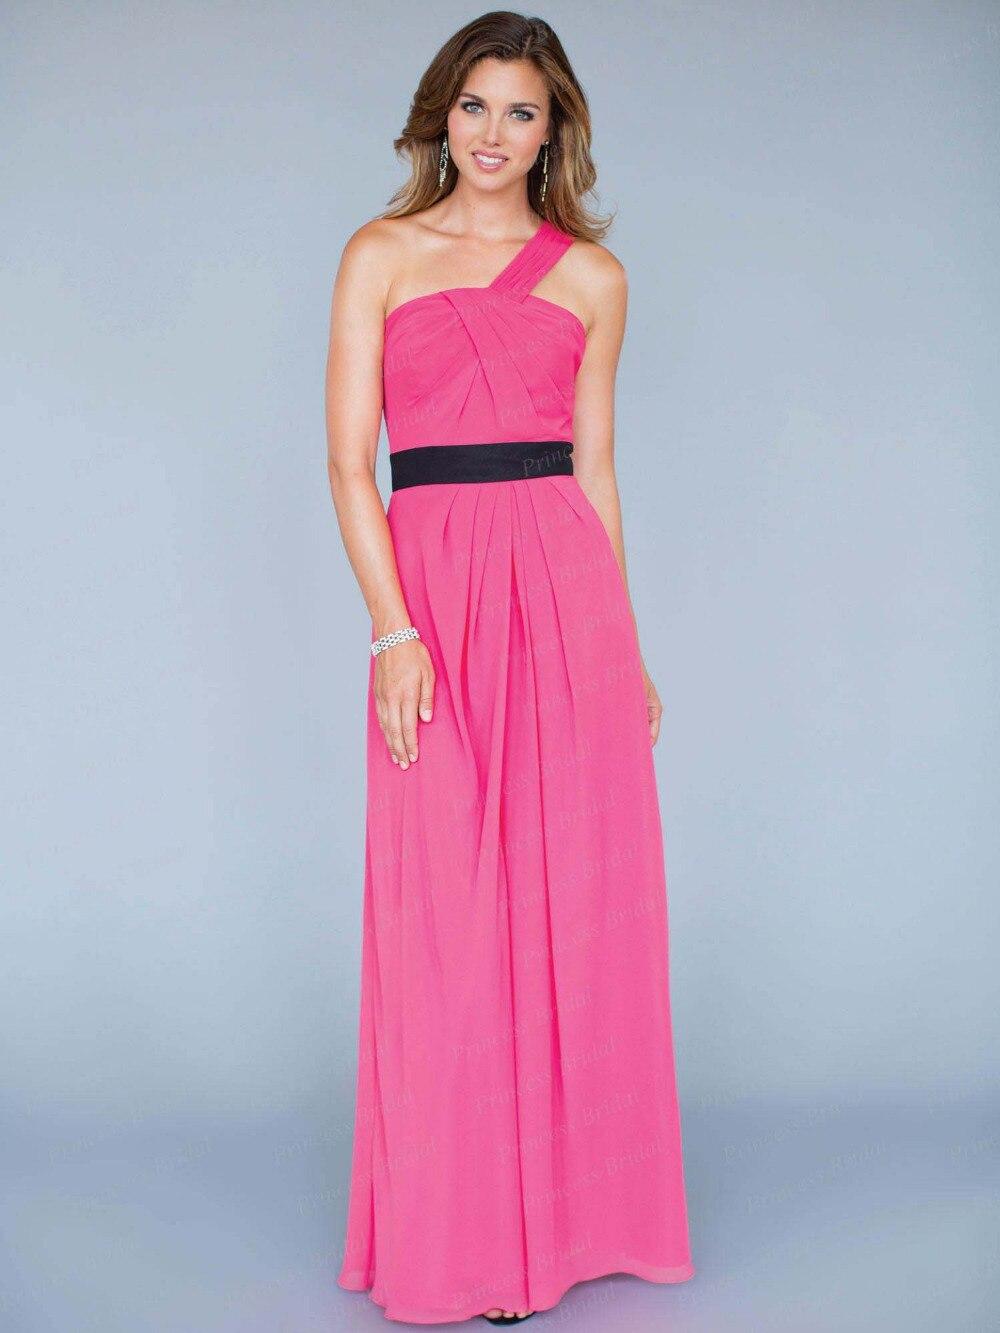 Free Shipping Fairytale Sheath Pleated Floor Length Chiffon Long Bridesmaid Dress One Shoulder BD078